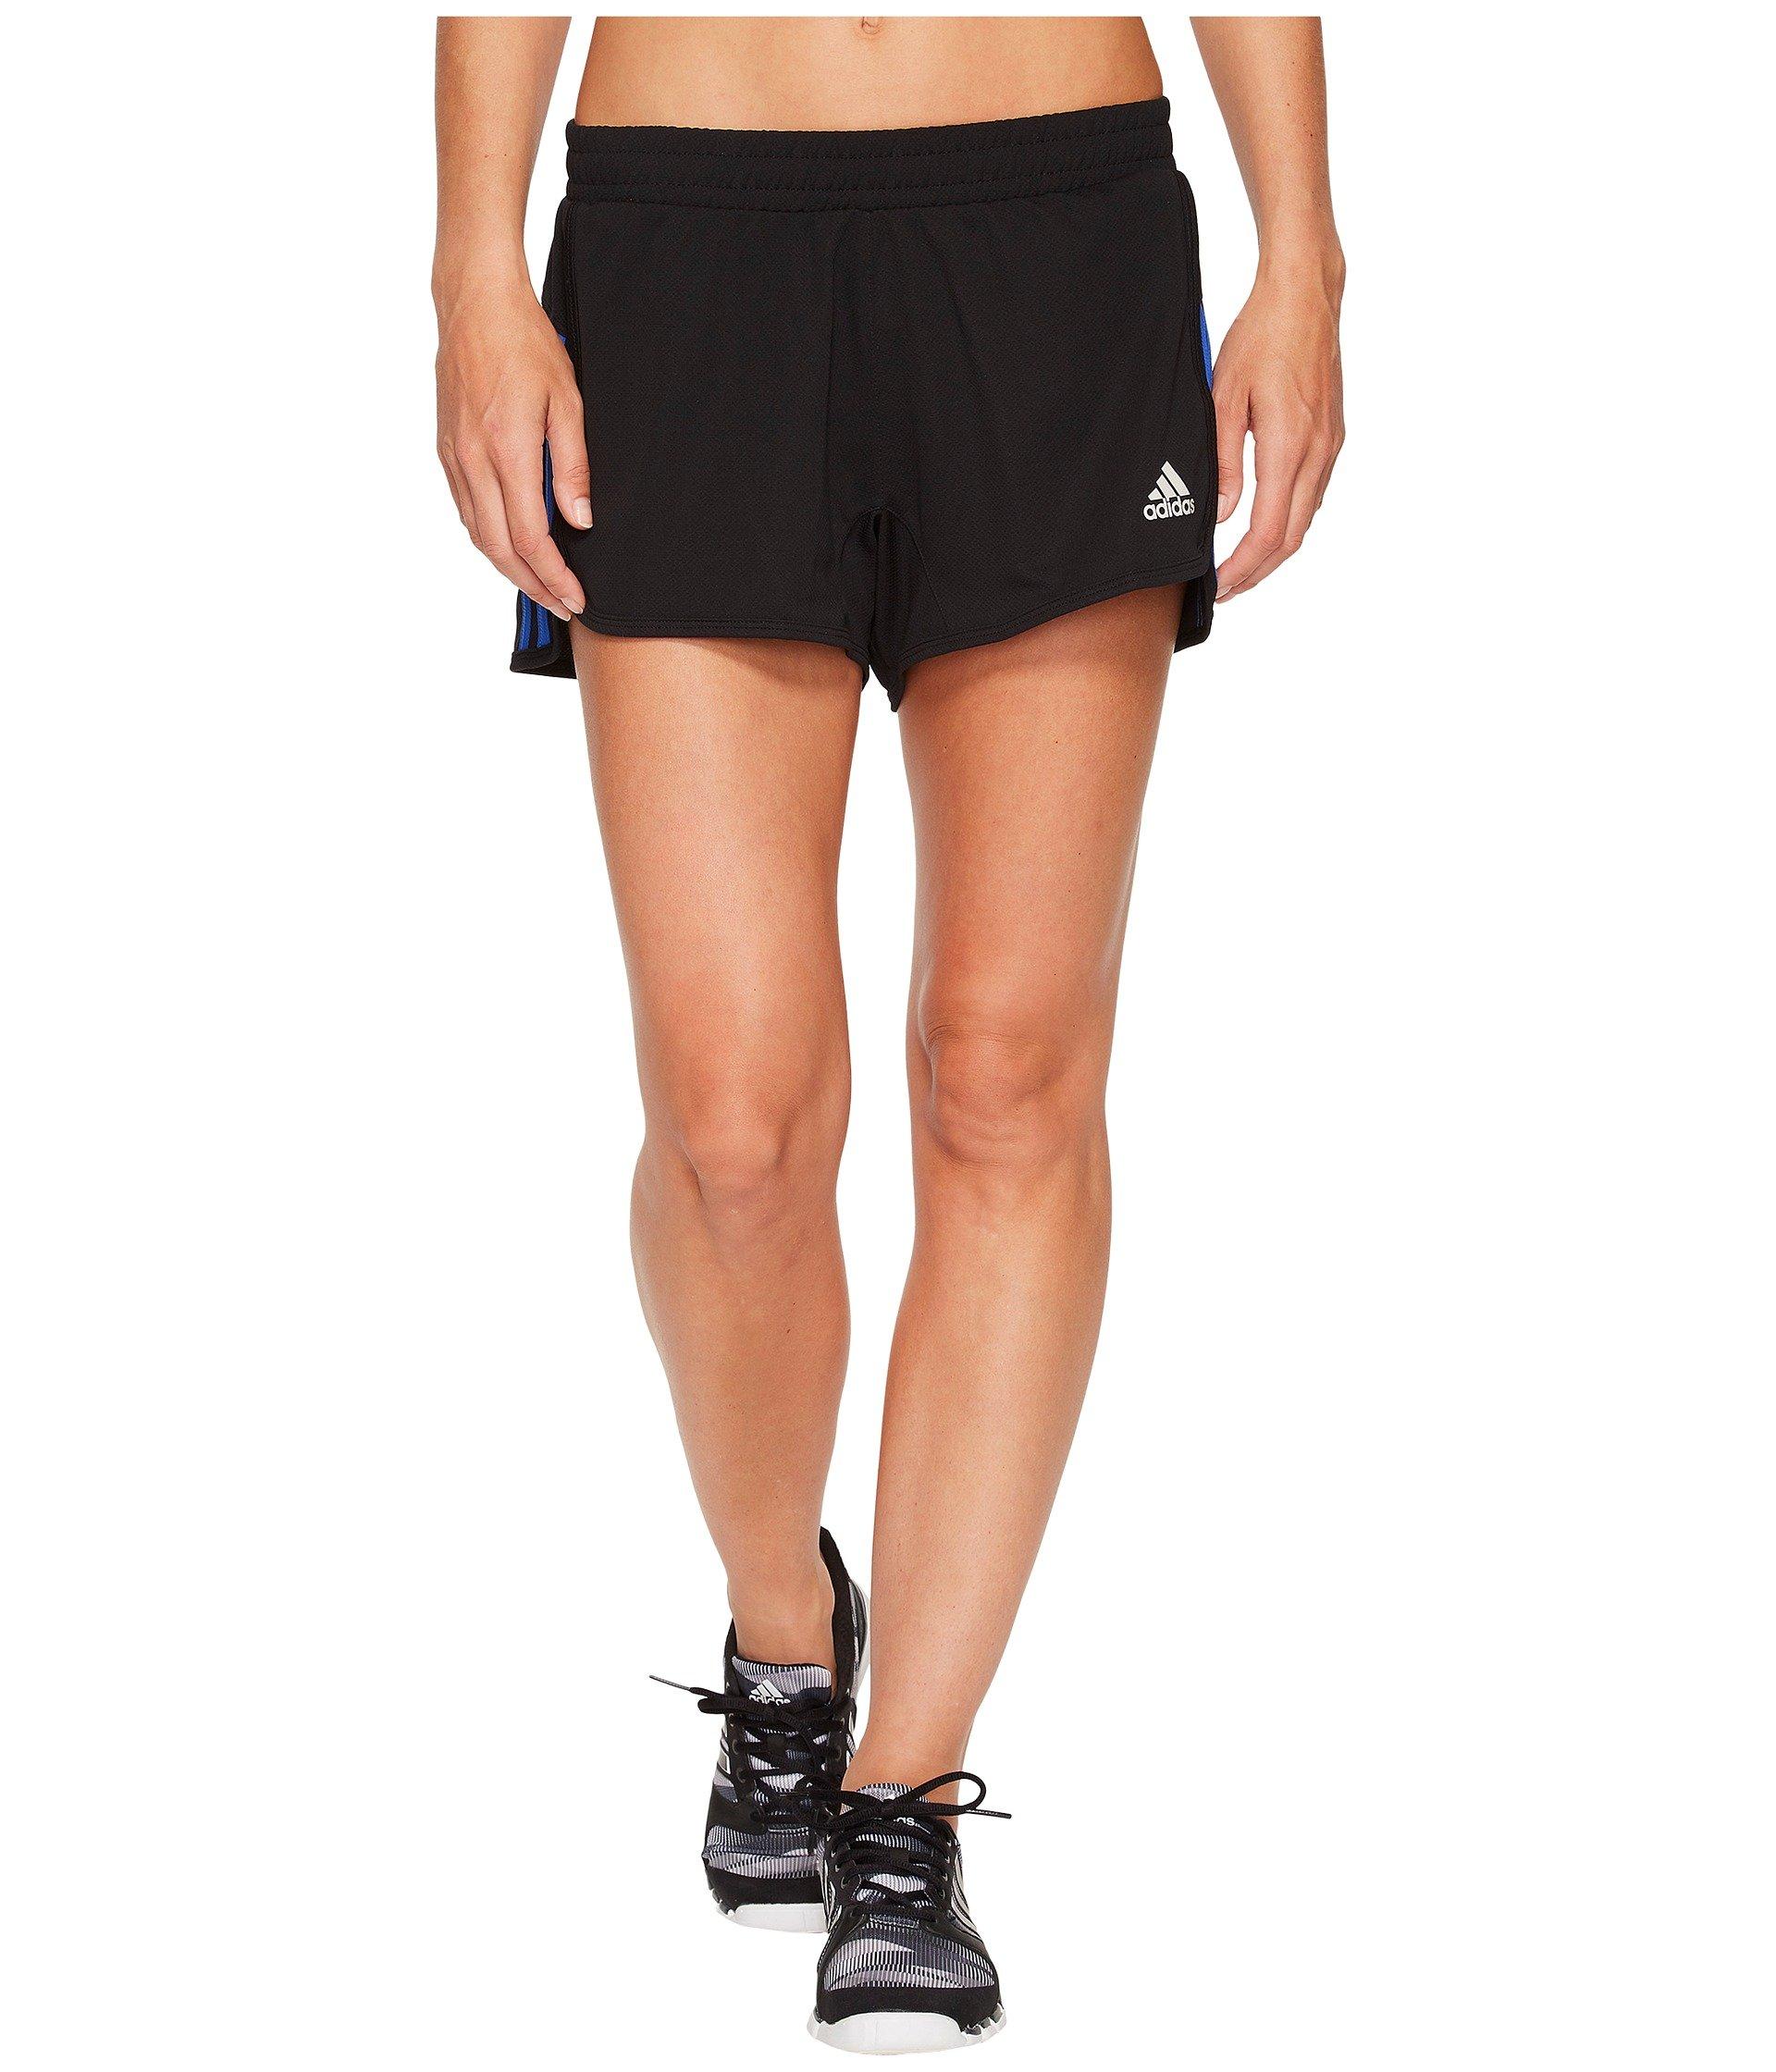 adidas D2m Knit Shorts Black/High-Res Blue LG by adidas